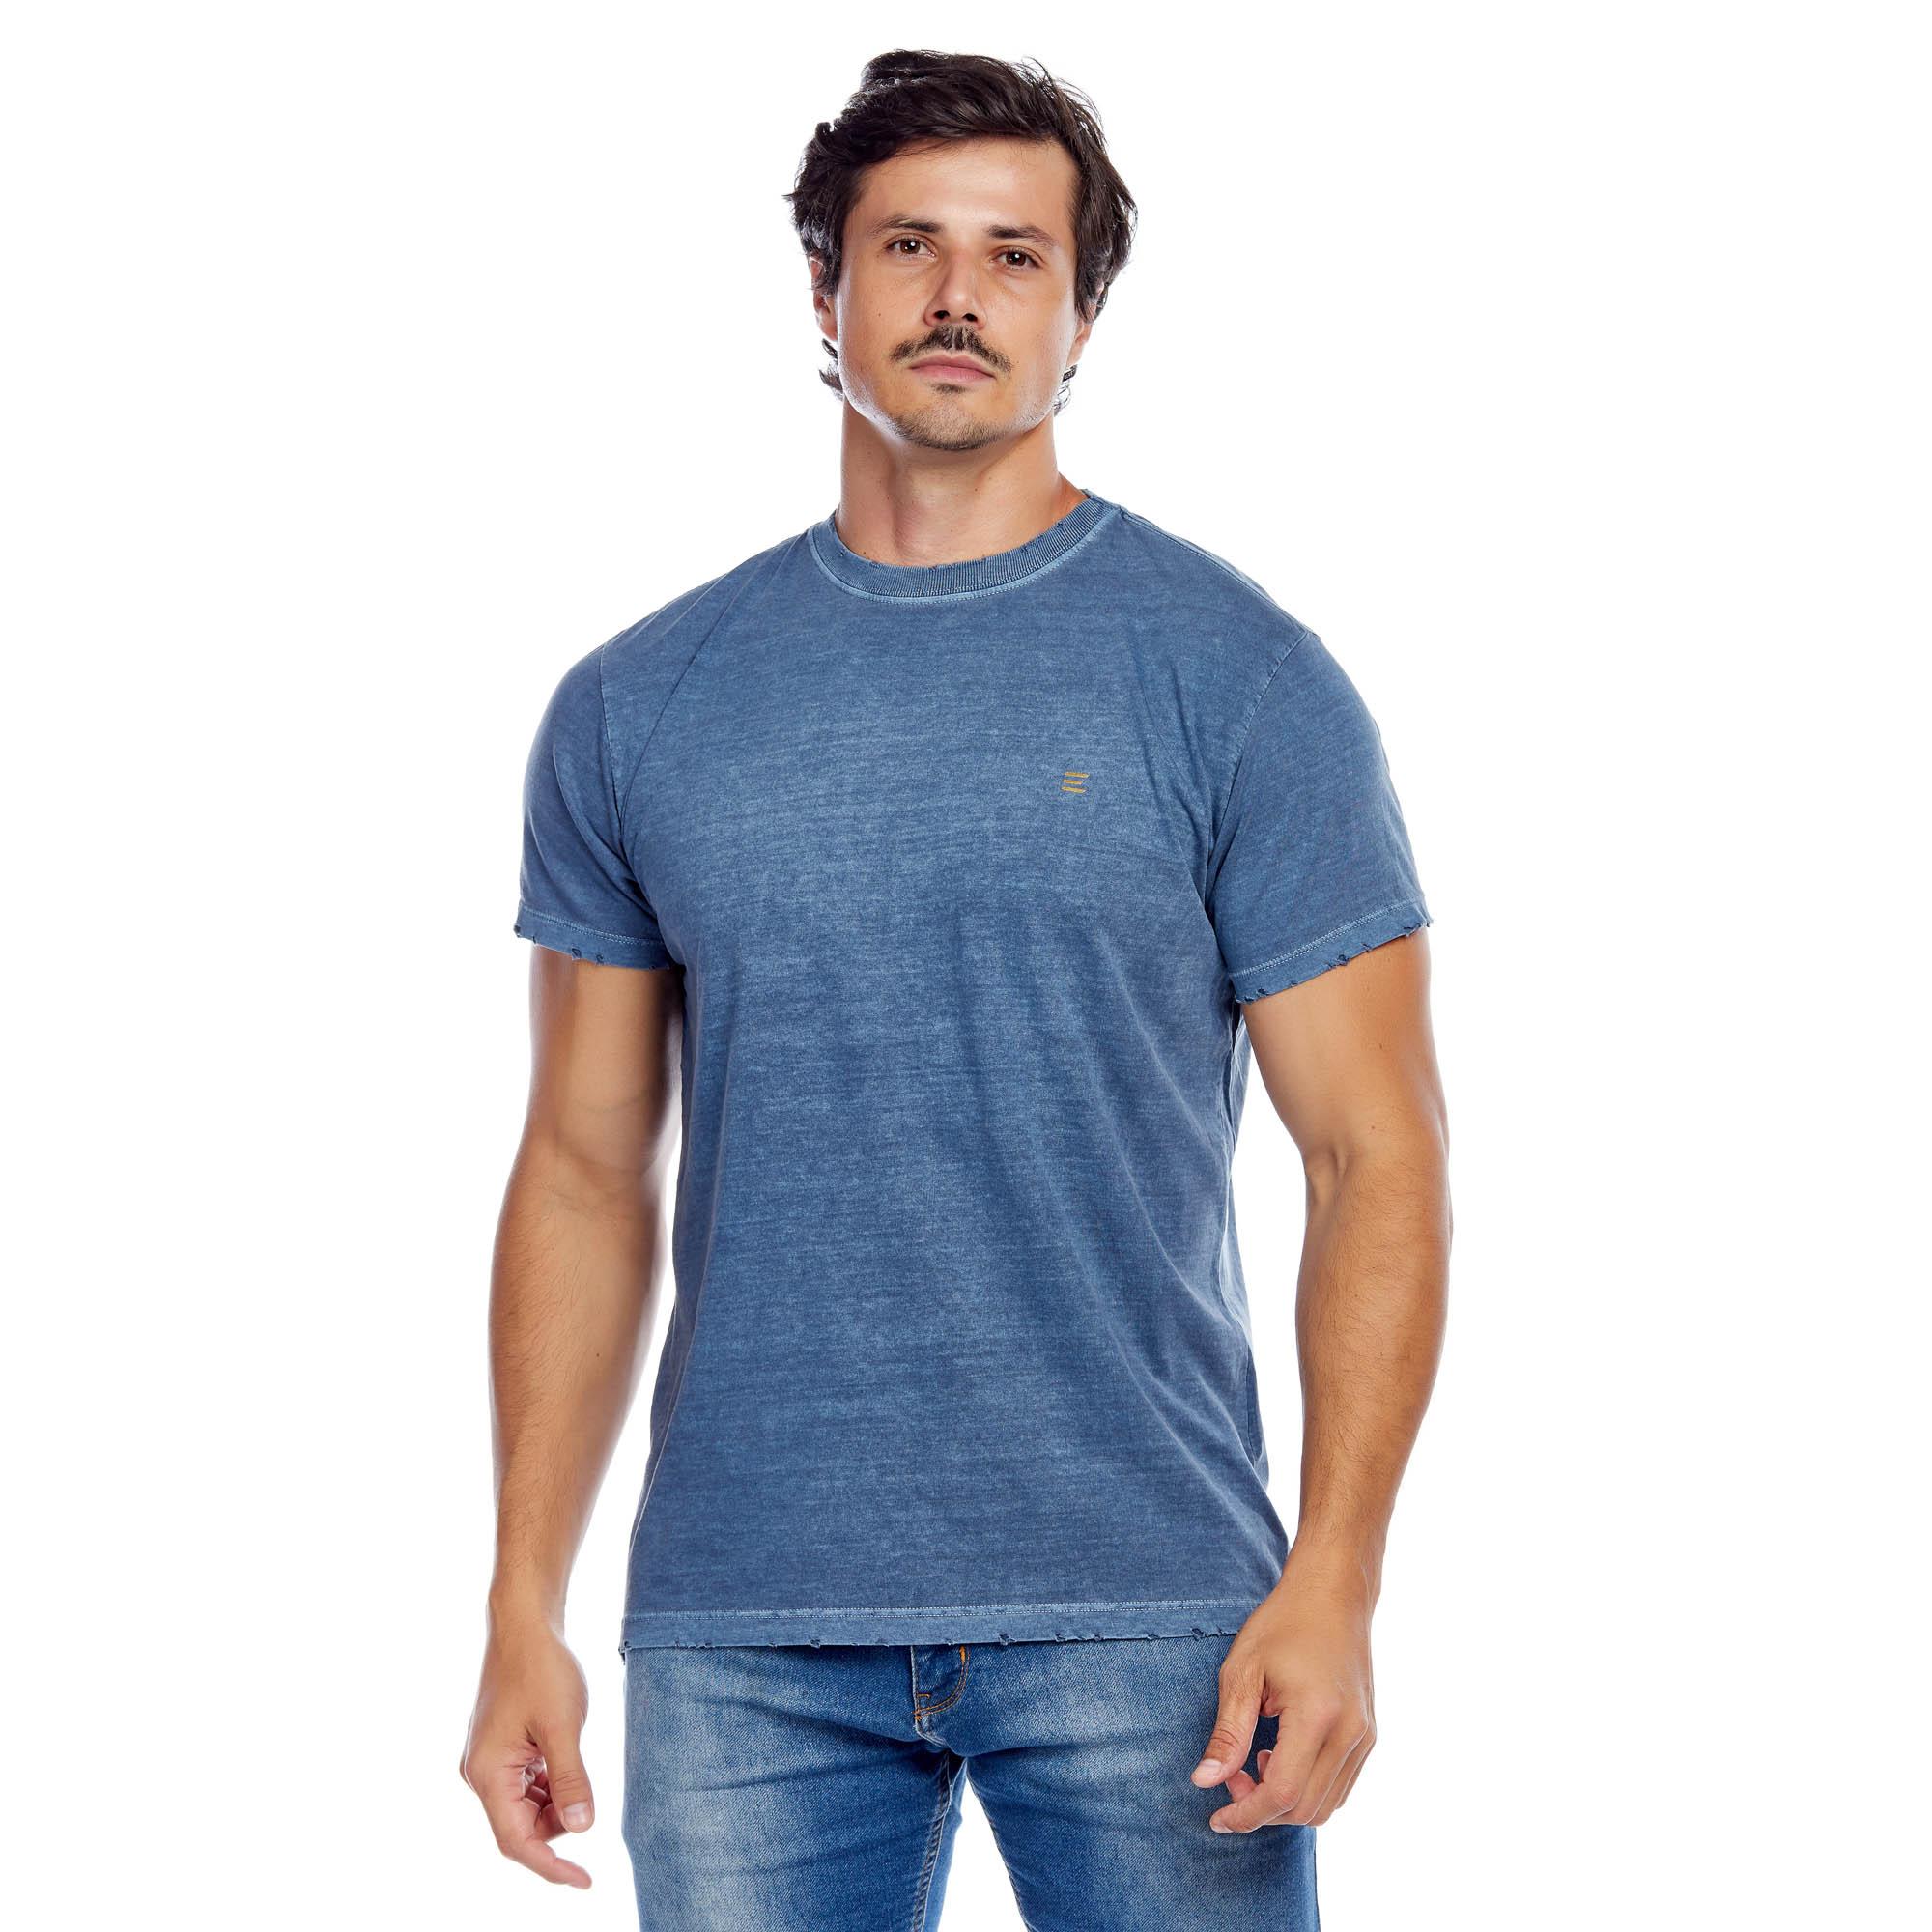 Camiseta Masculina Destroyer Evolvee